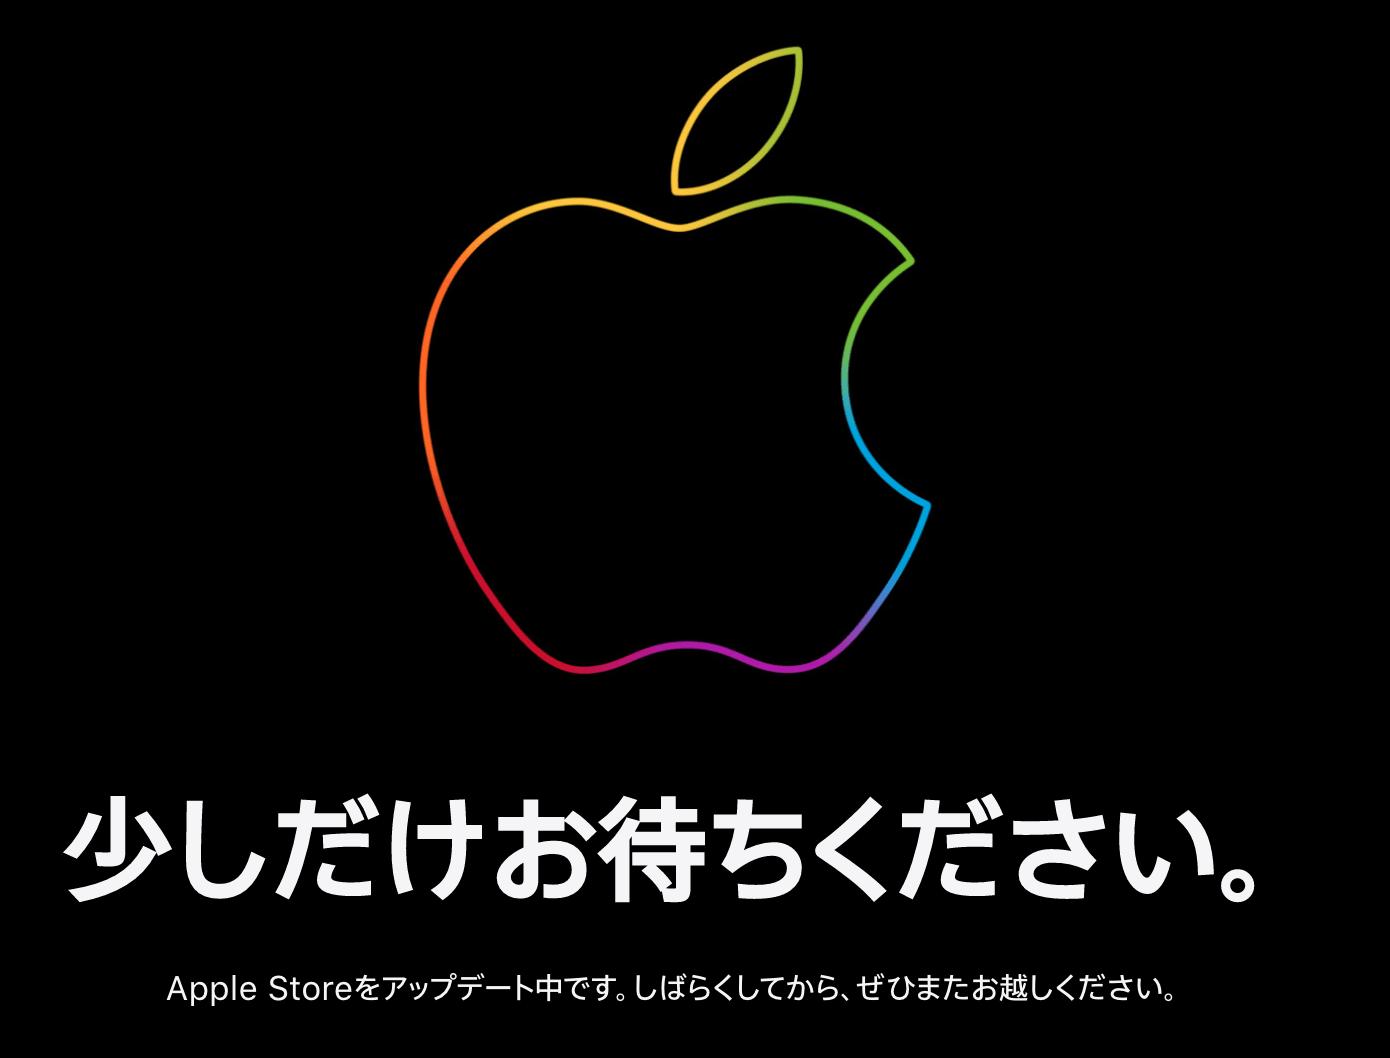 Applestore event